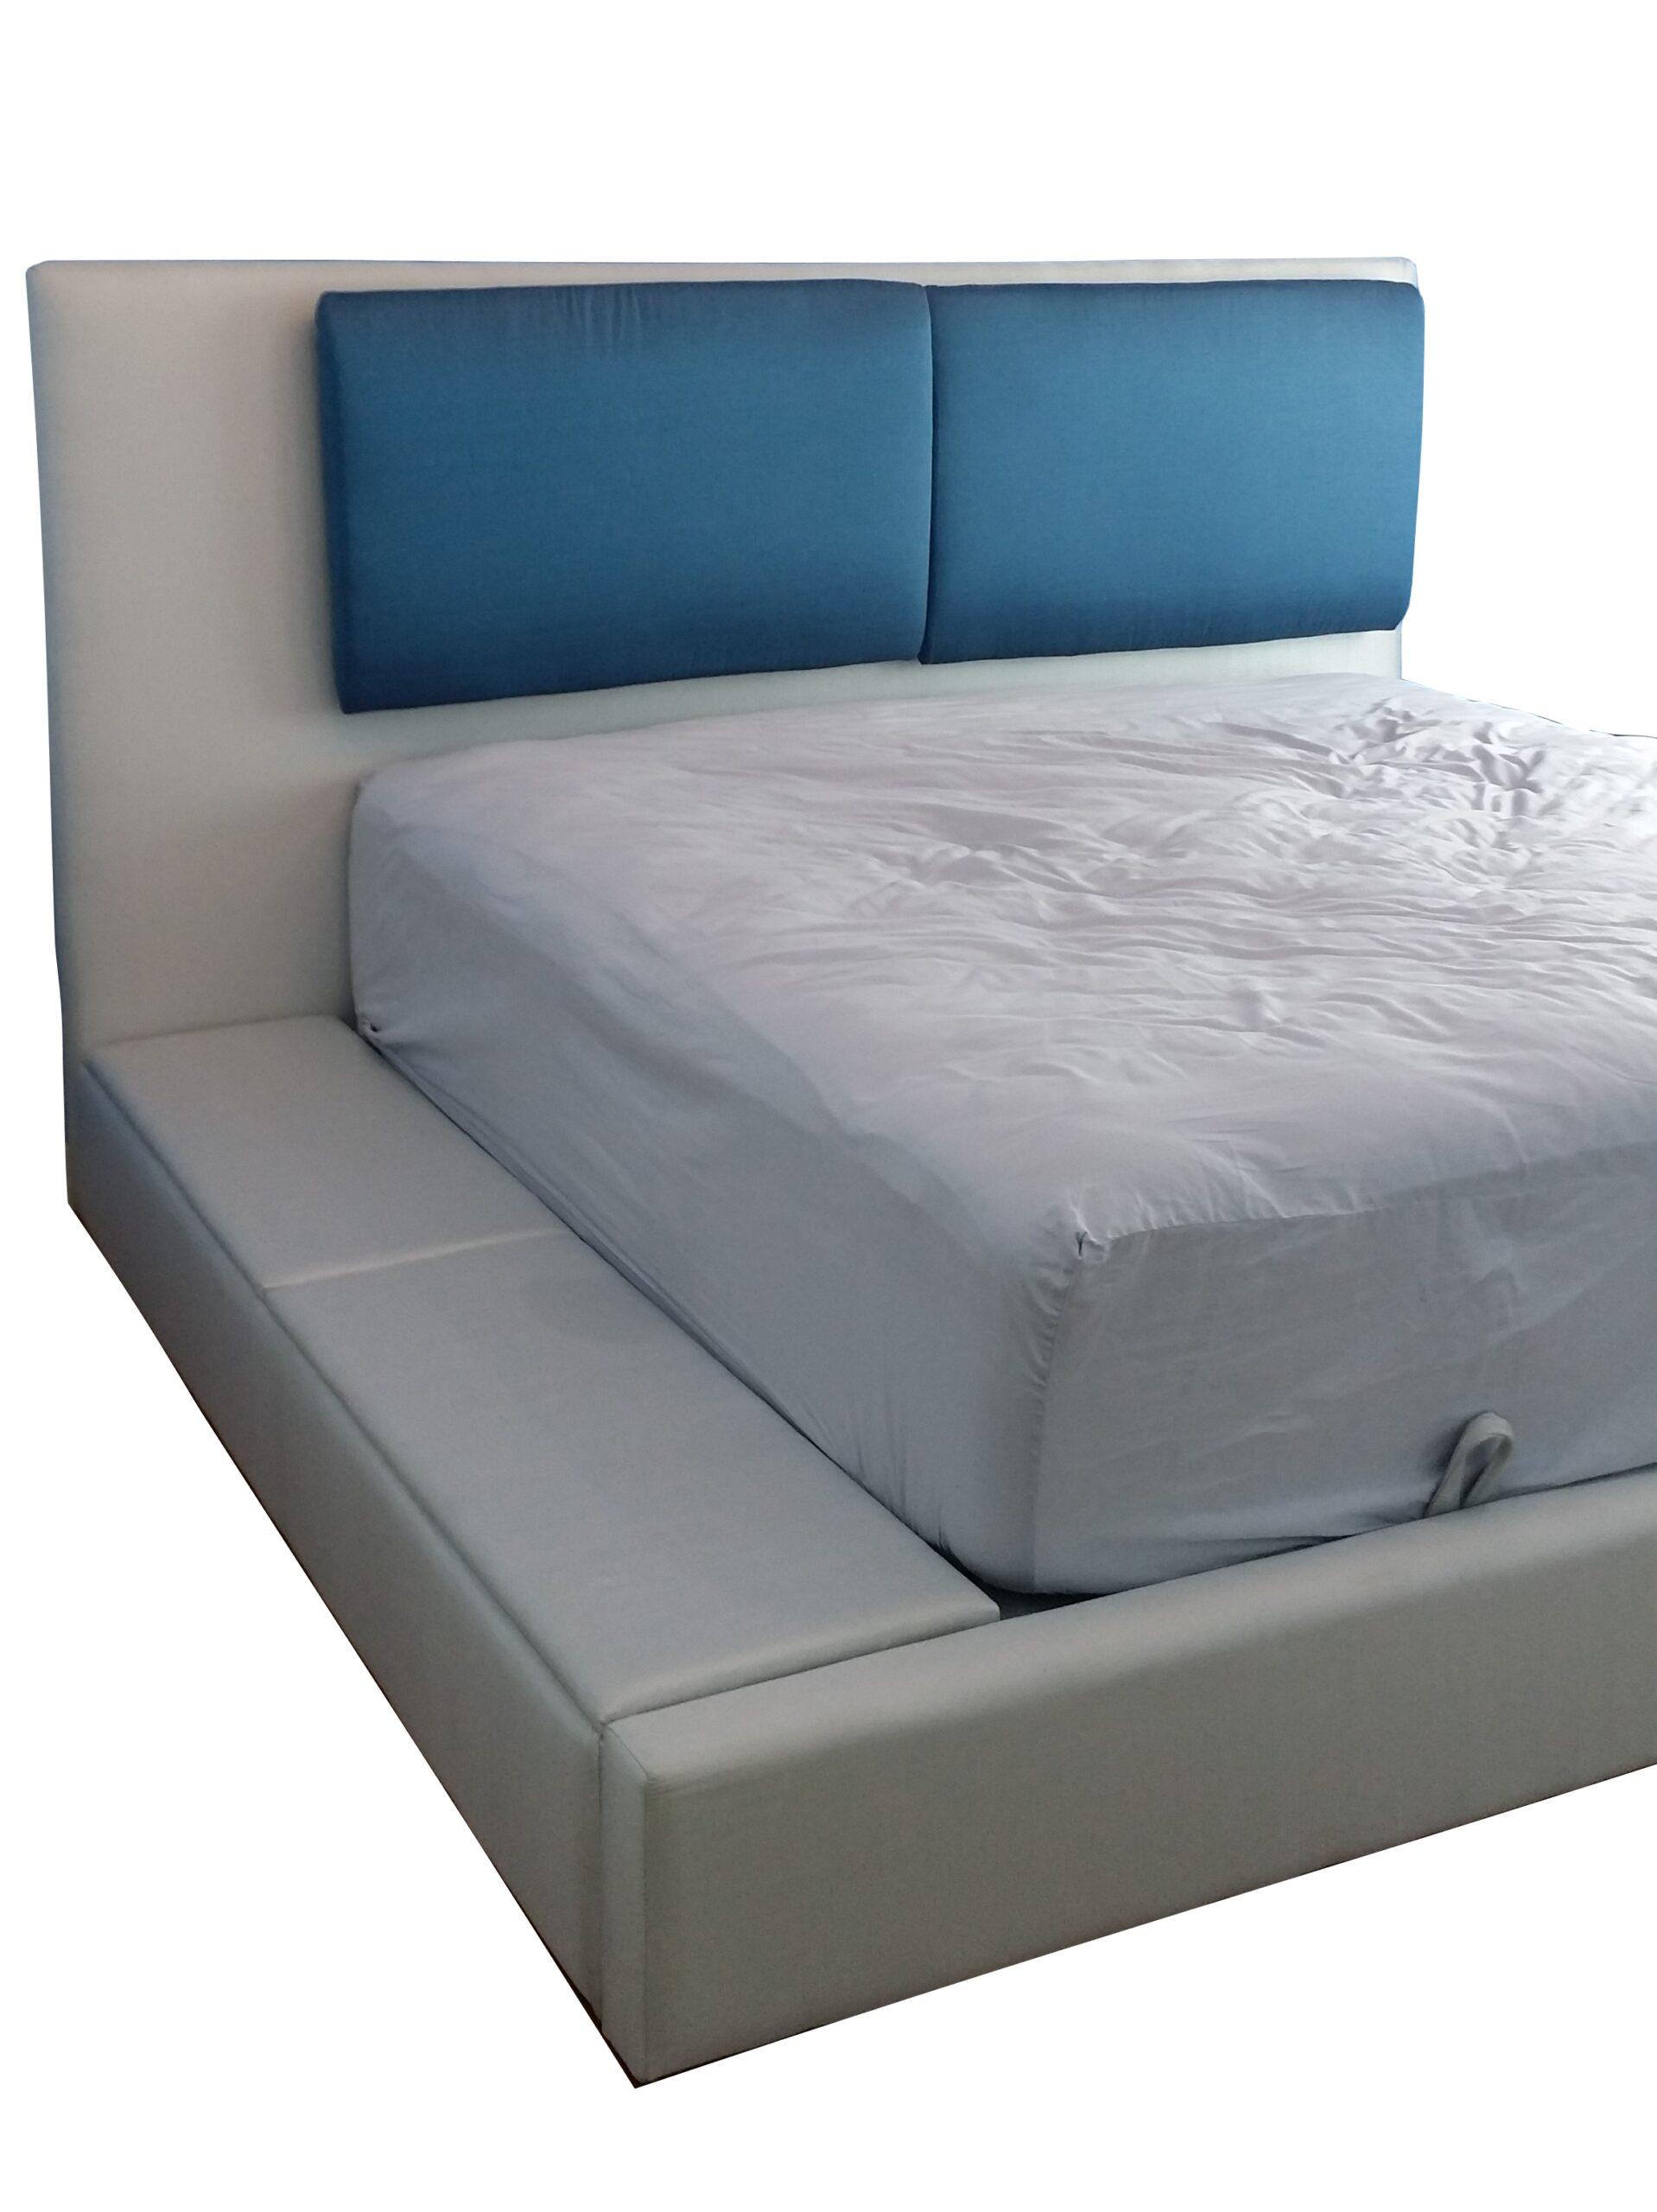 Mono Platform Bed Frame with Storage